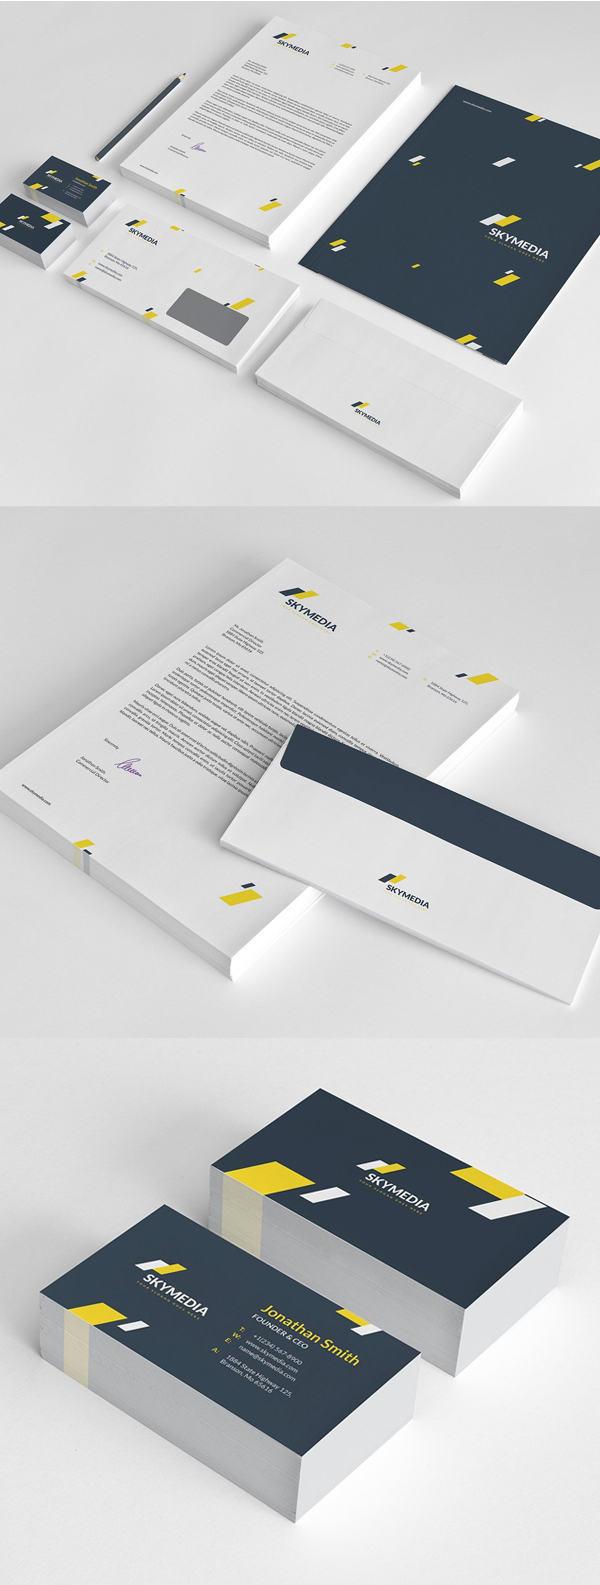 Modern Business Branding / Stationery Templates Design - 2